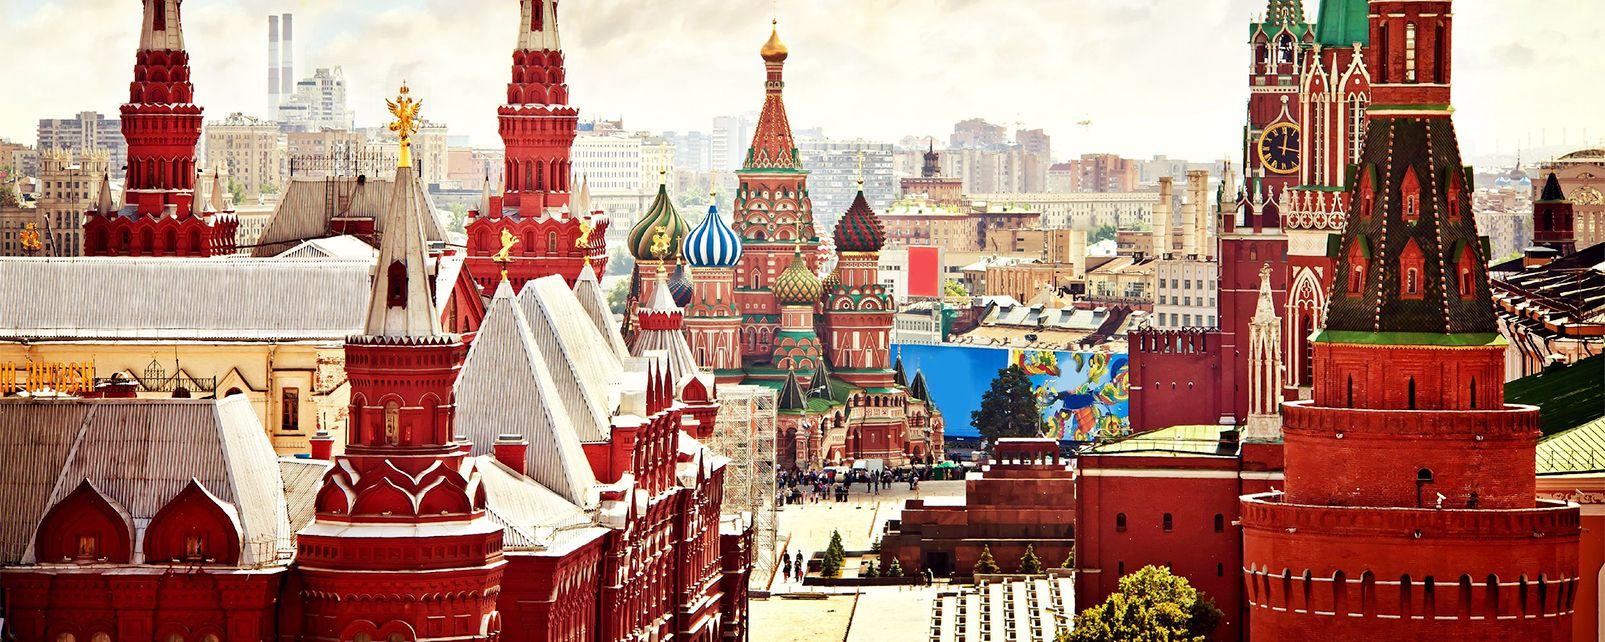 Mariage avec une femme russe en france Rsolu